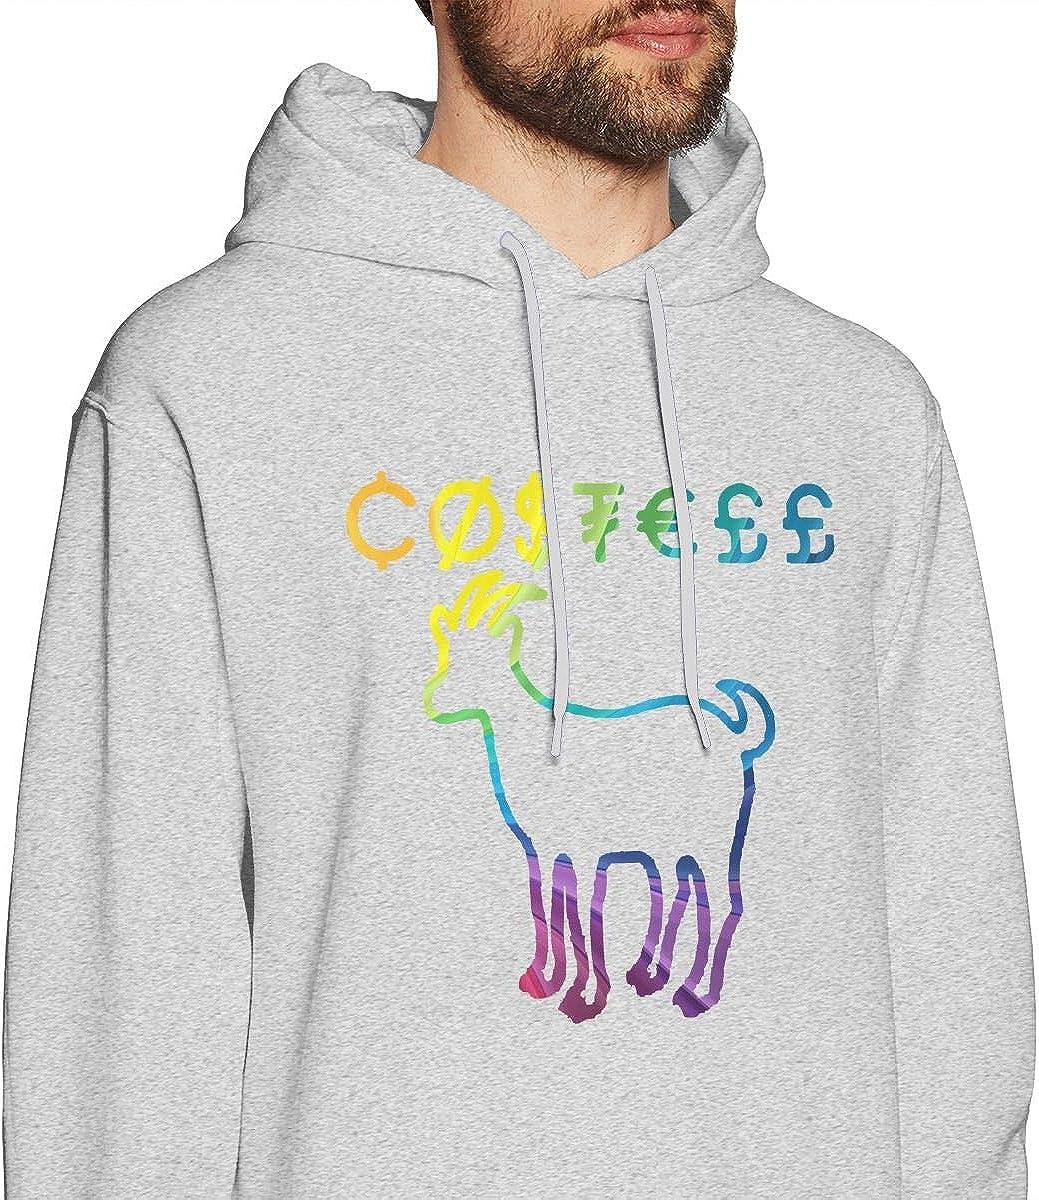 Patricia FordT Mens Winter Hooded Pocketless Sweatshirt Loose Erika Costell Logo White